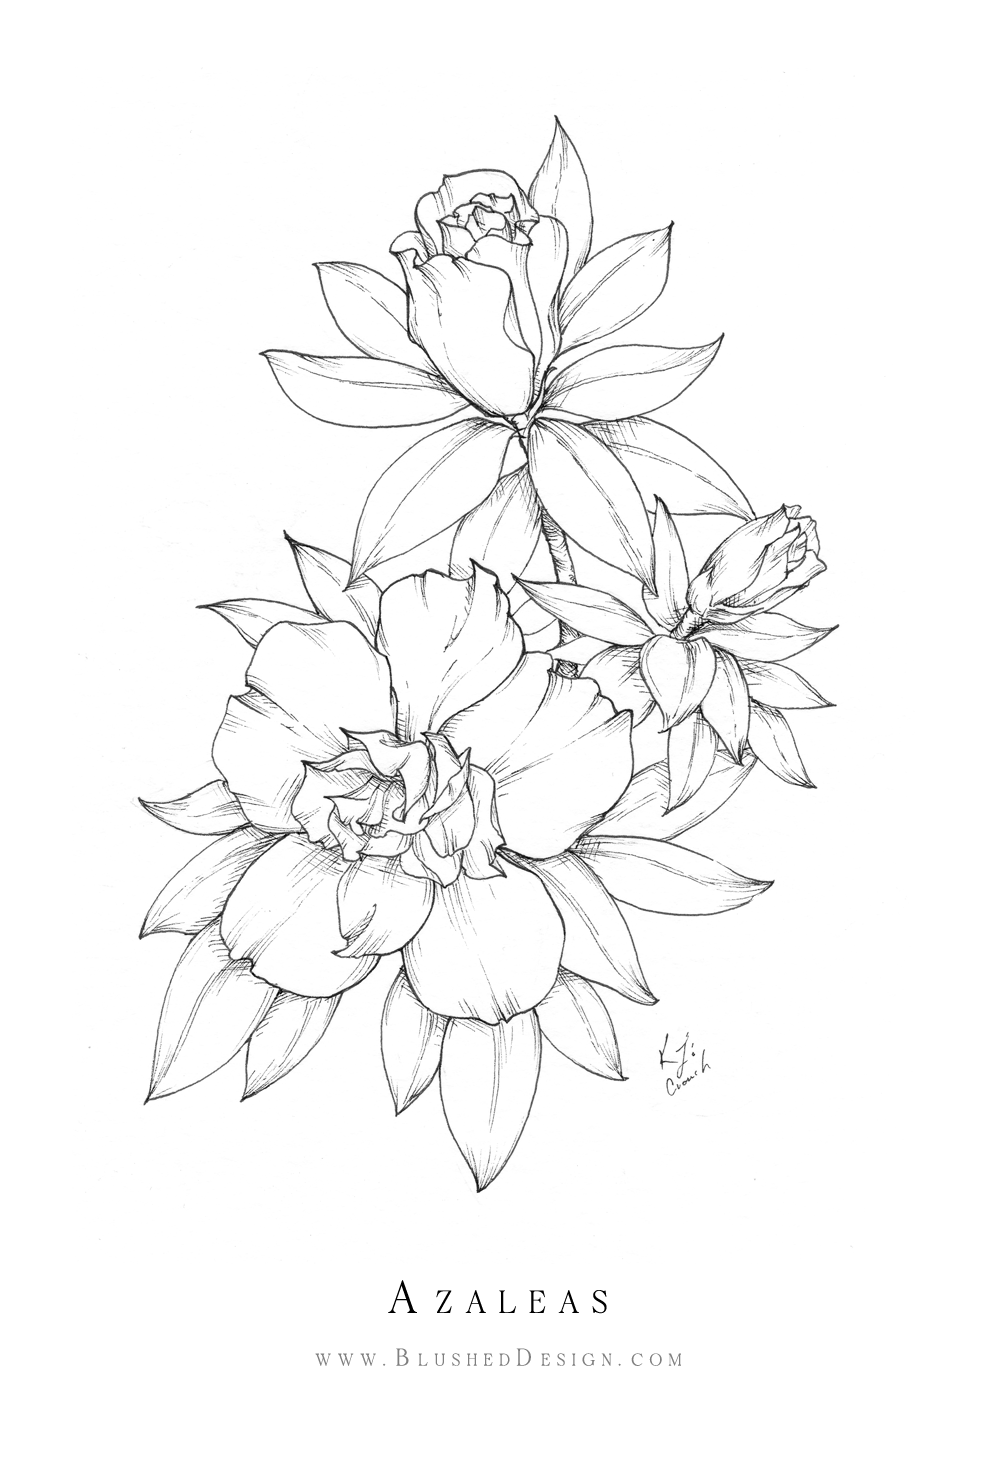 Inktober Flower Drawings 2019 Blushed Design In 2020 Realistic Flower Drawing Beautiful Flower Drawings Cute Flower Drawing